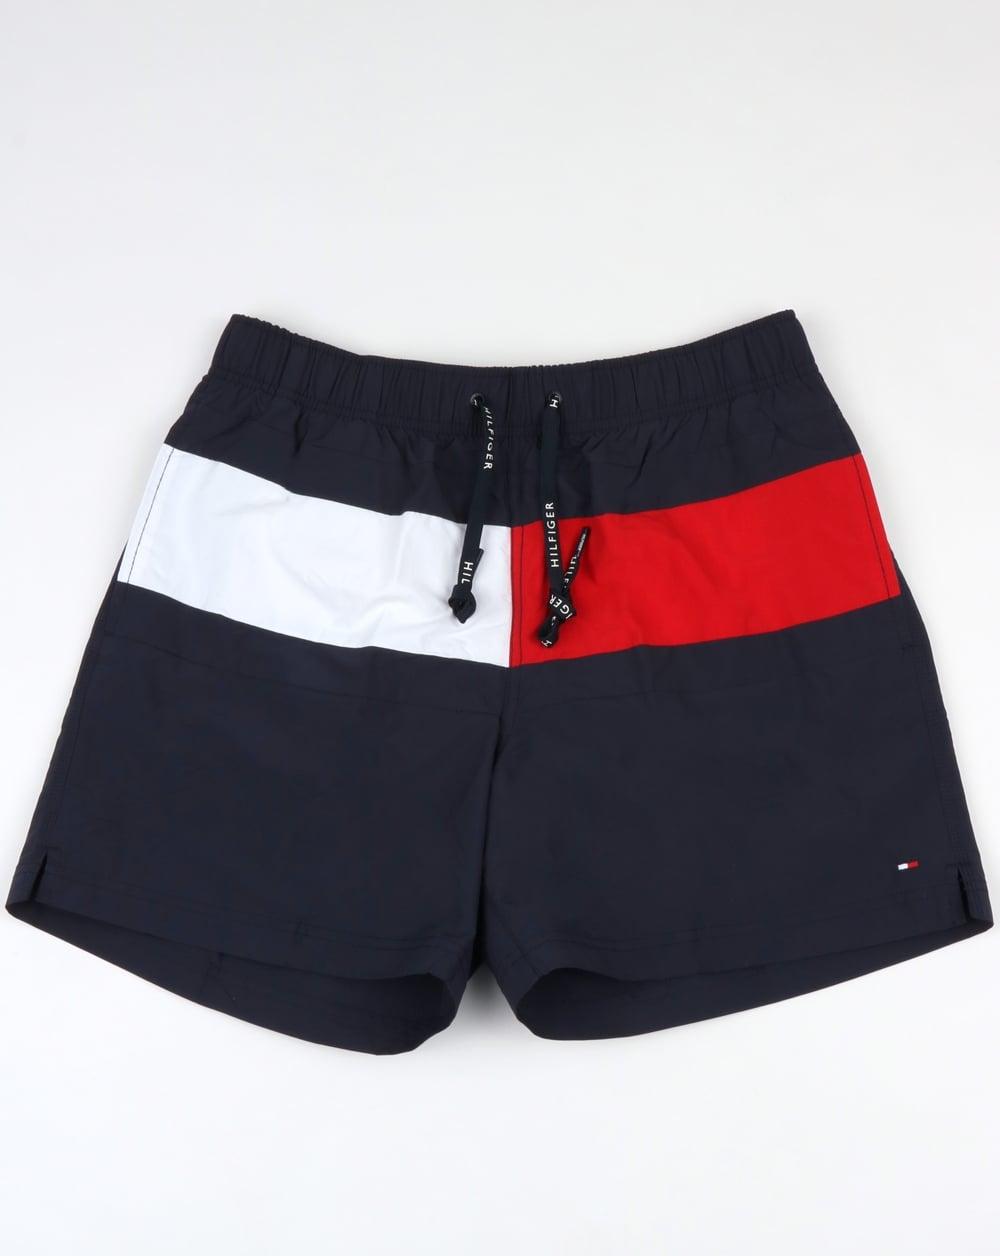 96ef977ab7 Tommy Hilfiger Flag Swim Shorts Navy,beach,swimmers,holiday